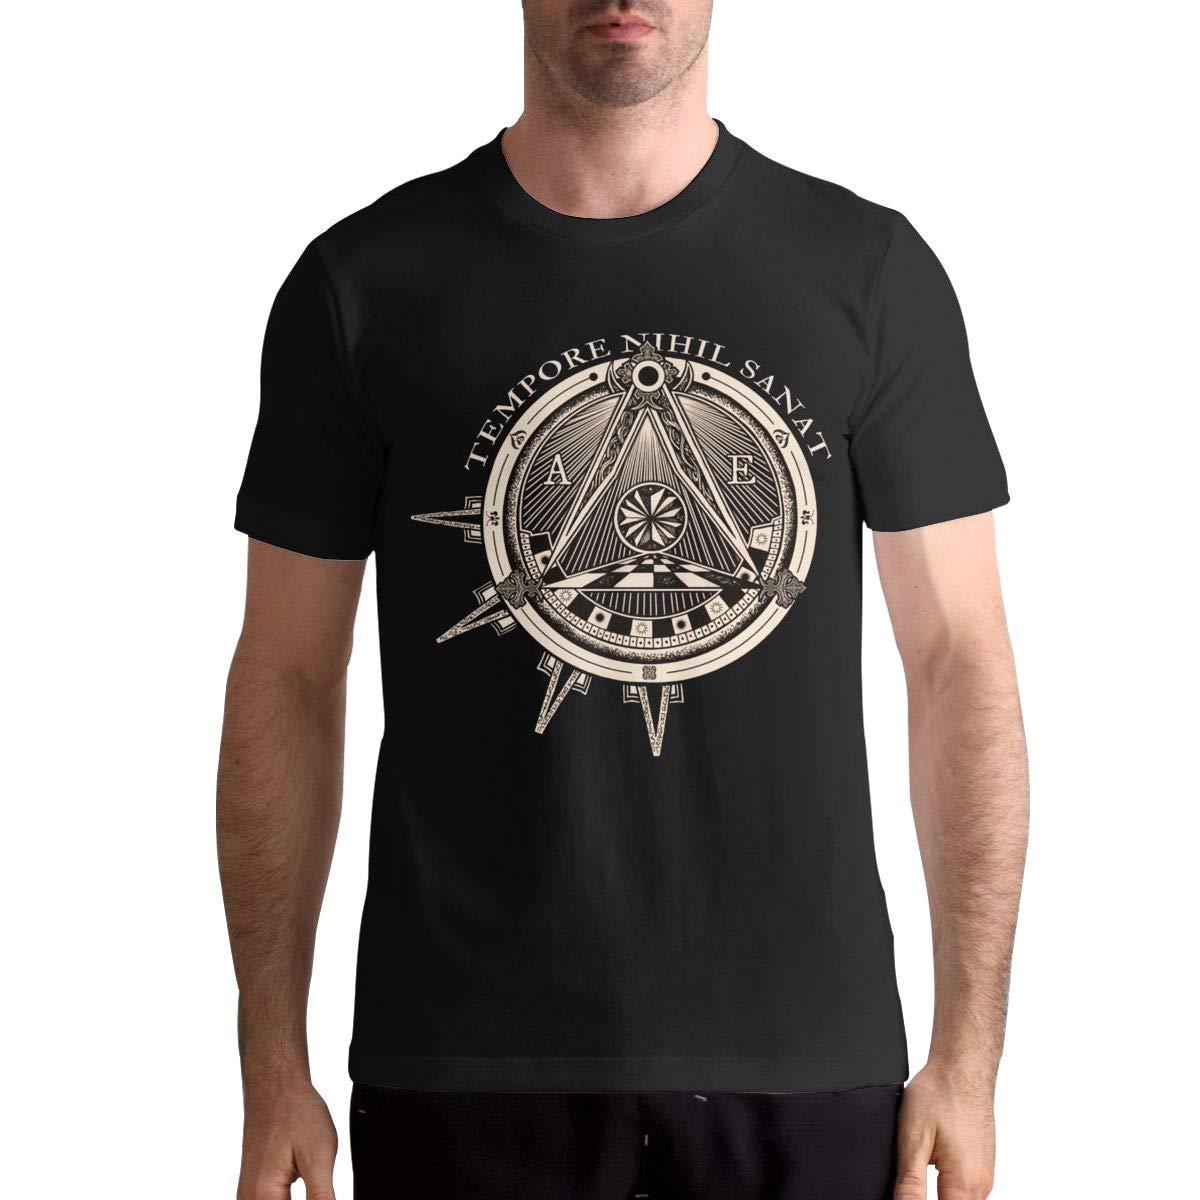 Hye D Riche Arch Enemy Logo Men Funny Short Sleeve Music Band Shirt Shirt Black